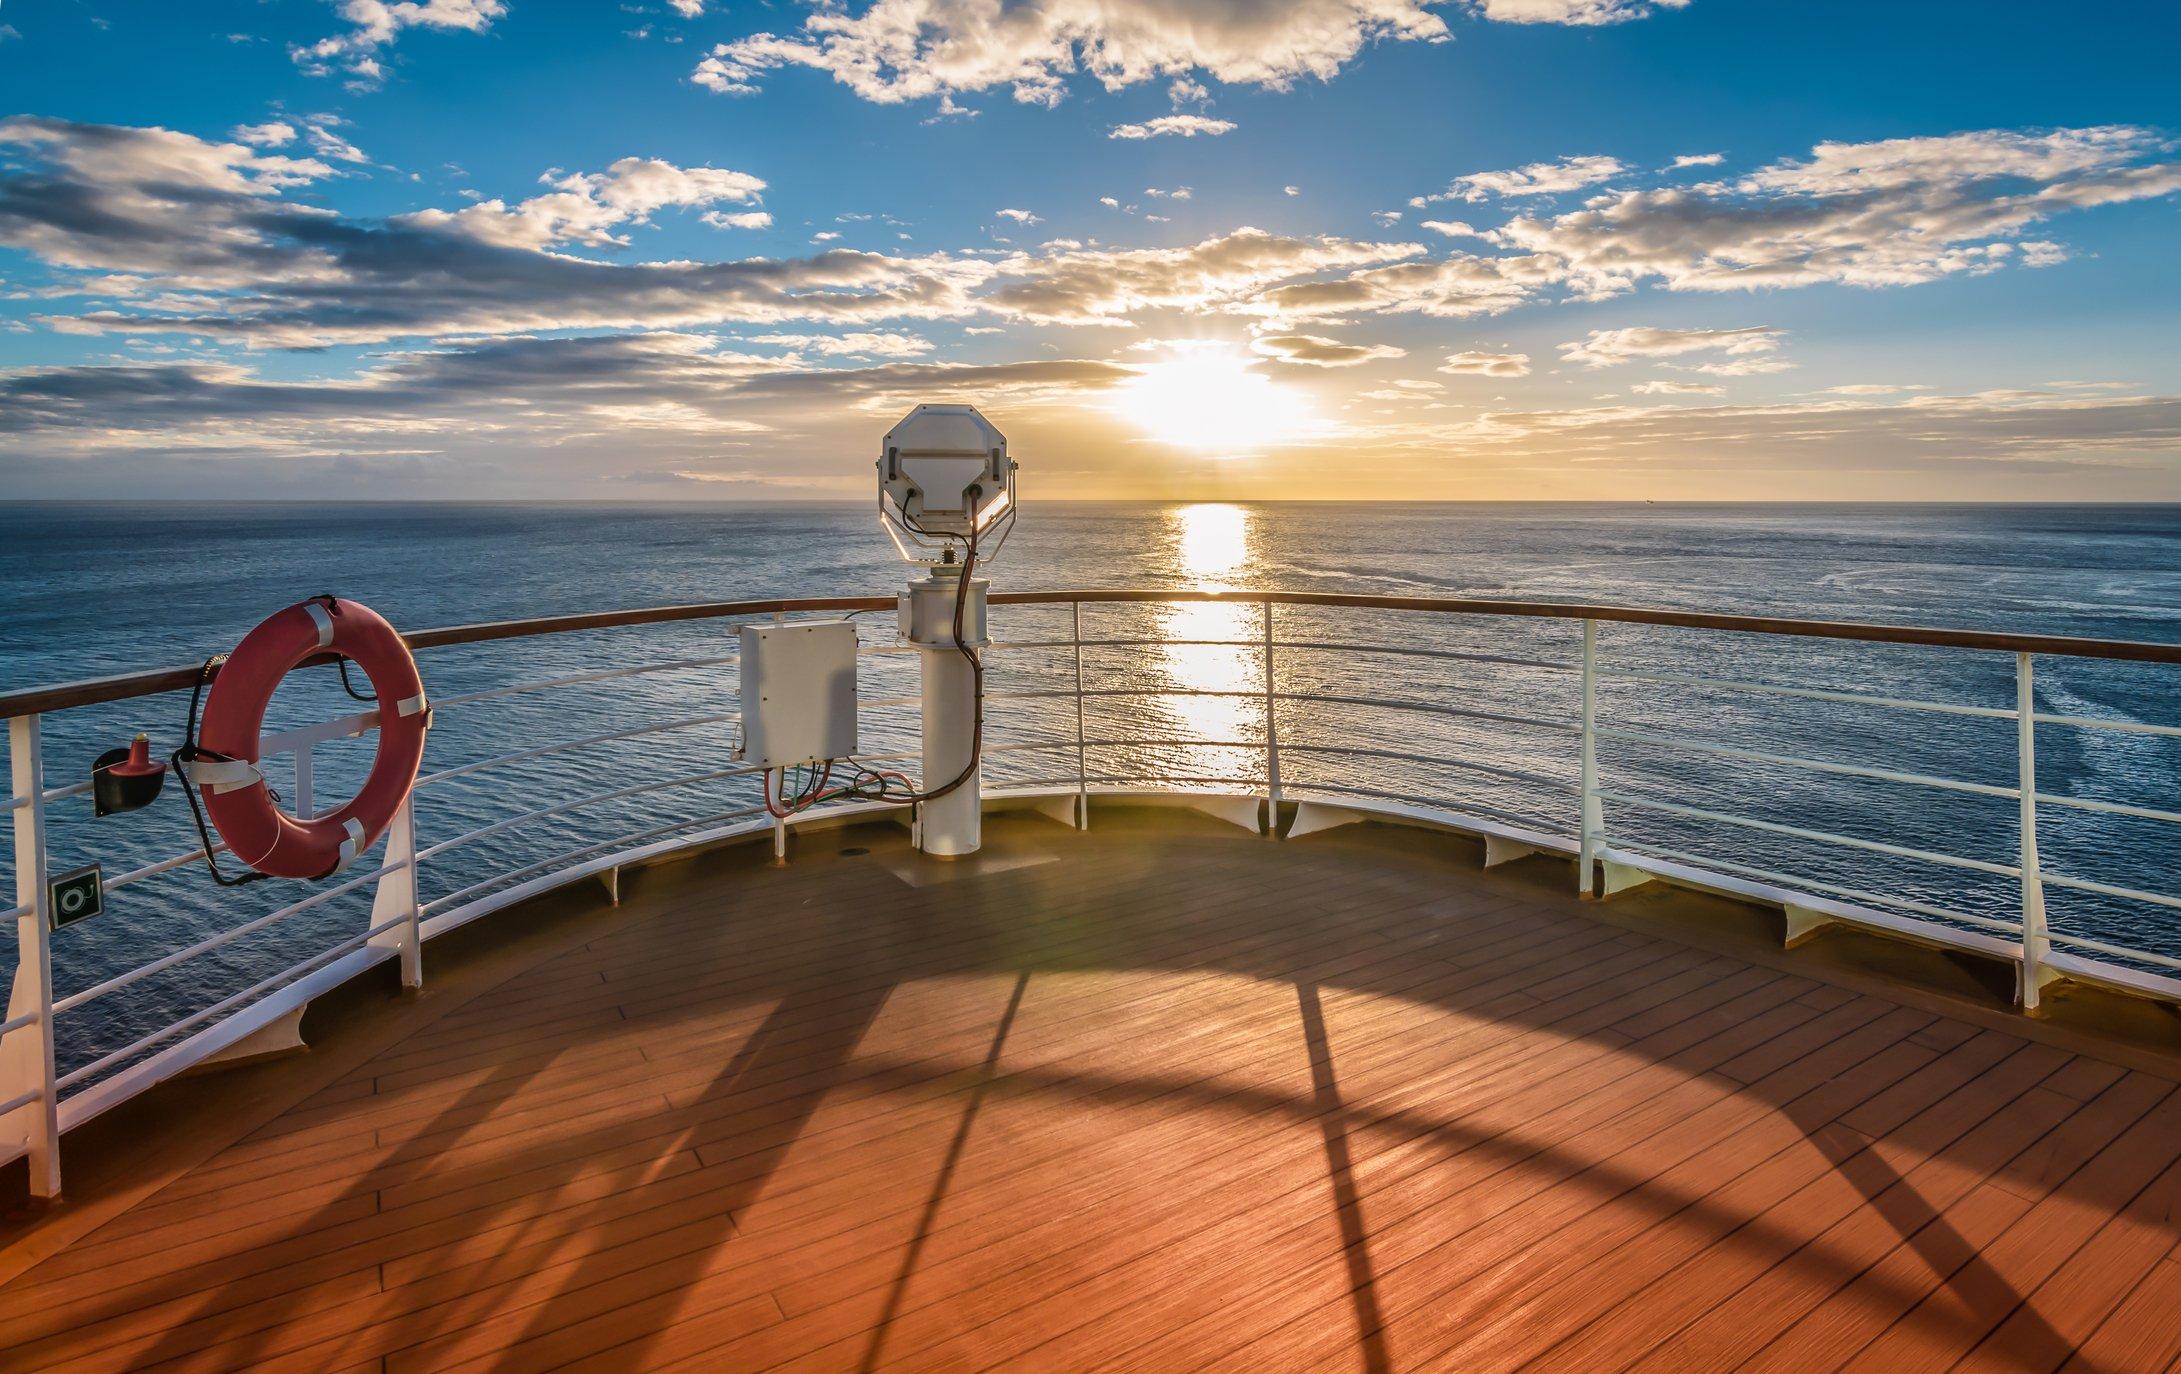 Transatlantic Cruise at Sunset